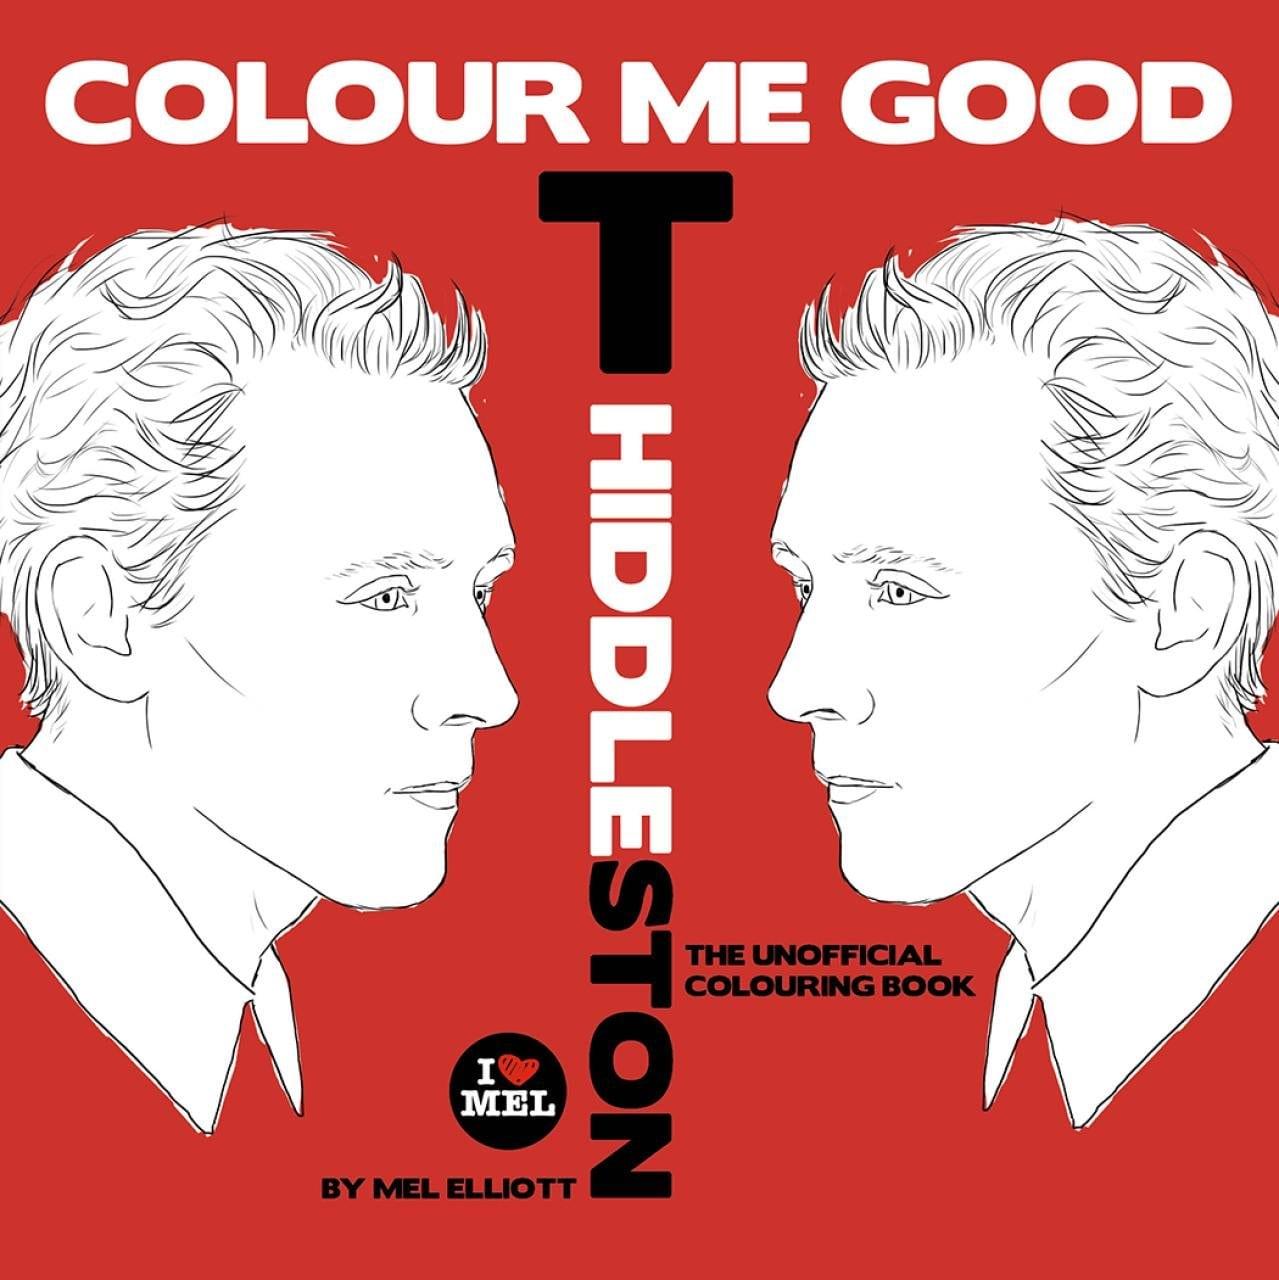 Colour Me Good Tom Hiddleston  Mel Elliott  9780992854430  Amazon